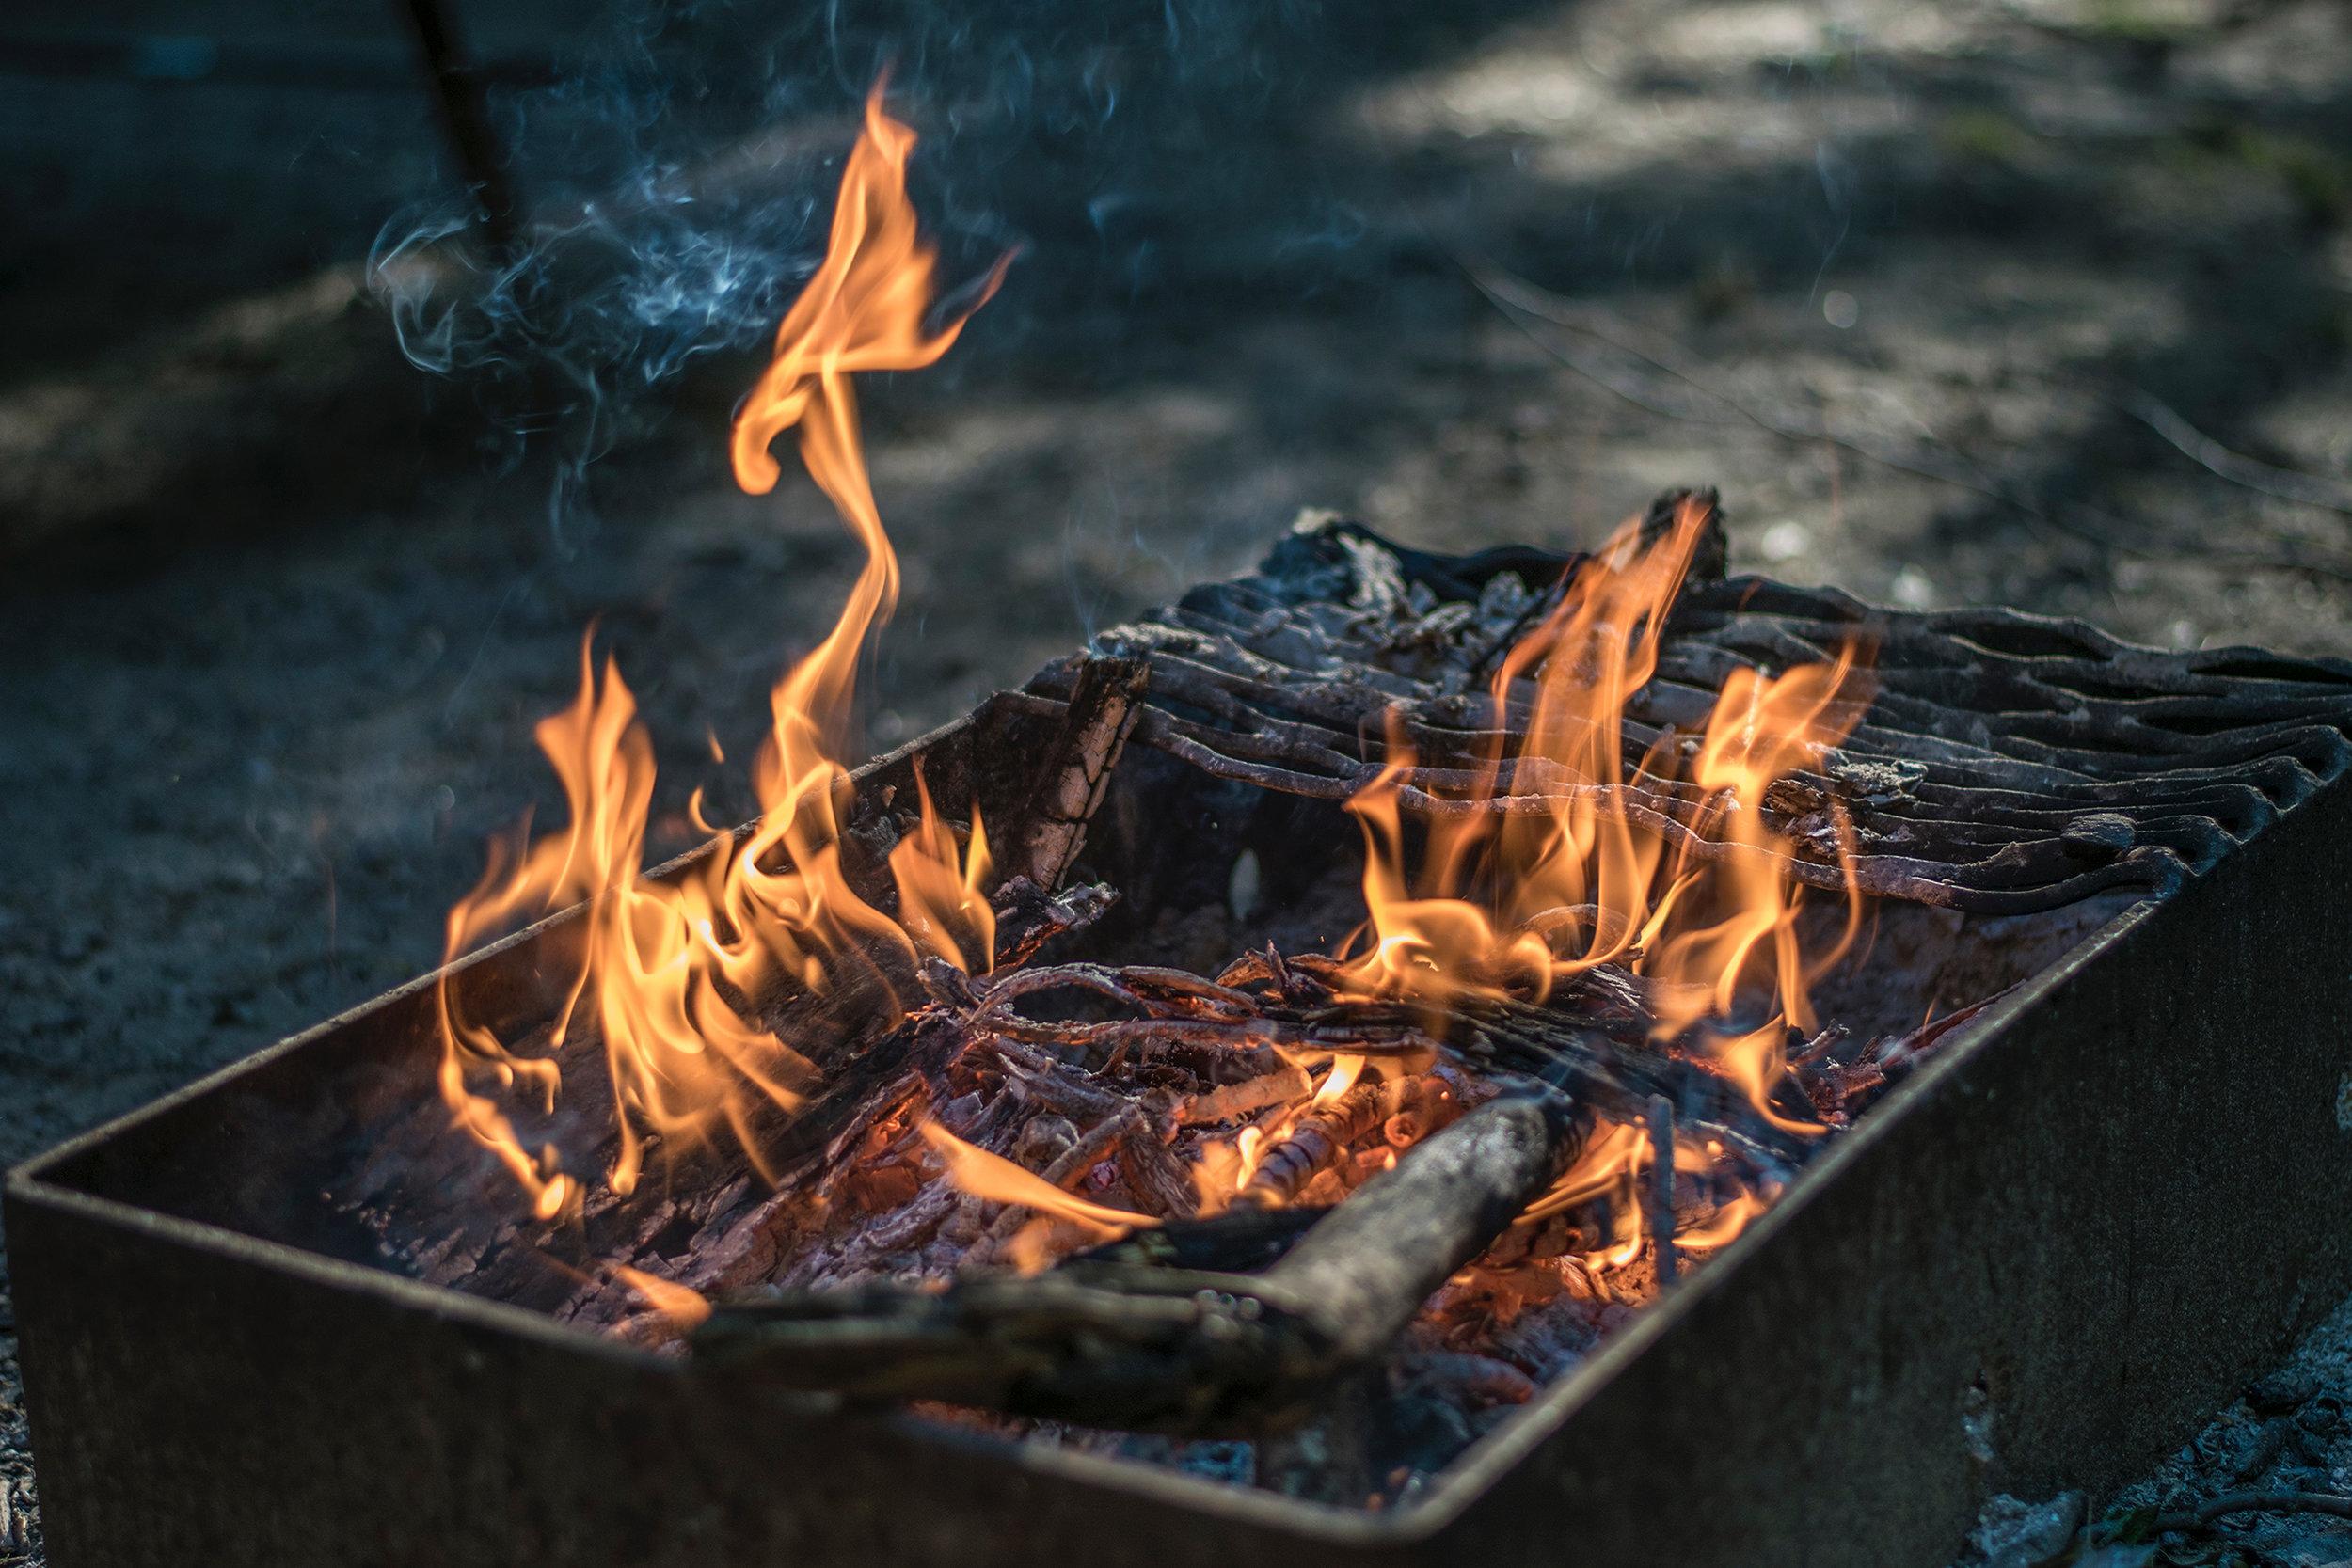 Best BBQ in Port Royal, South Carolina